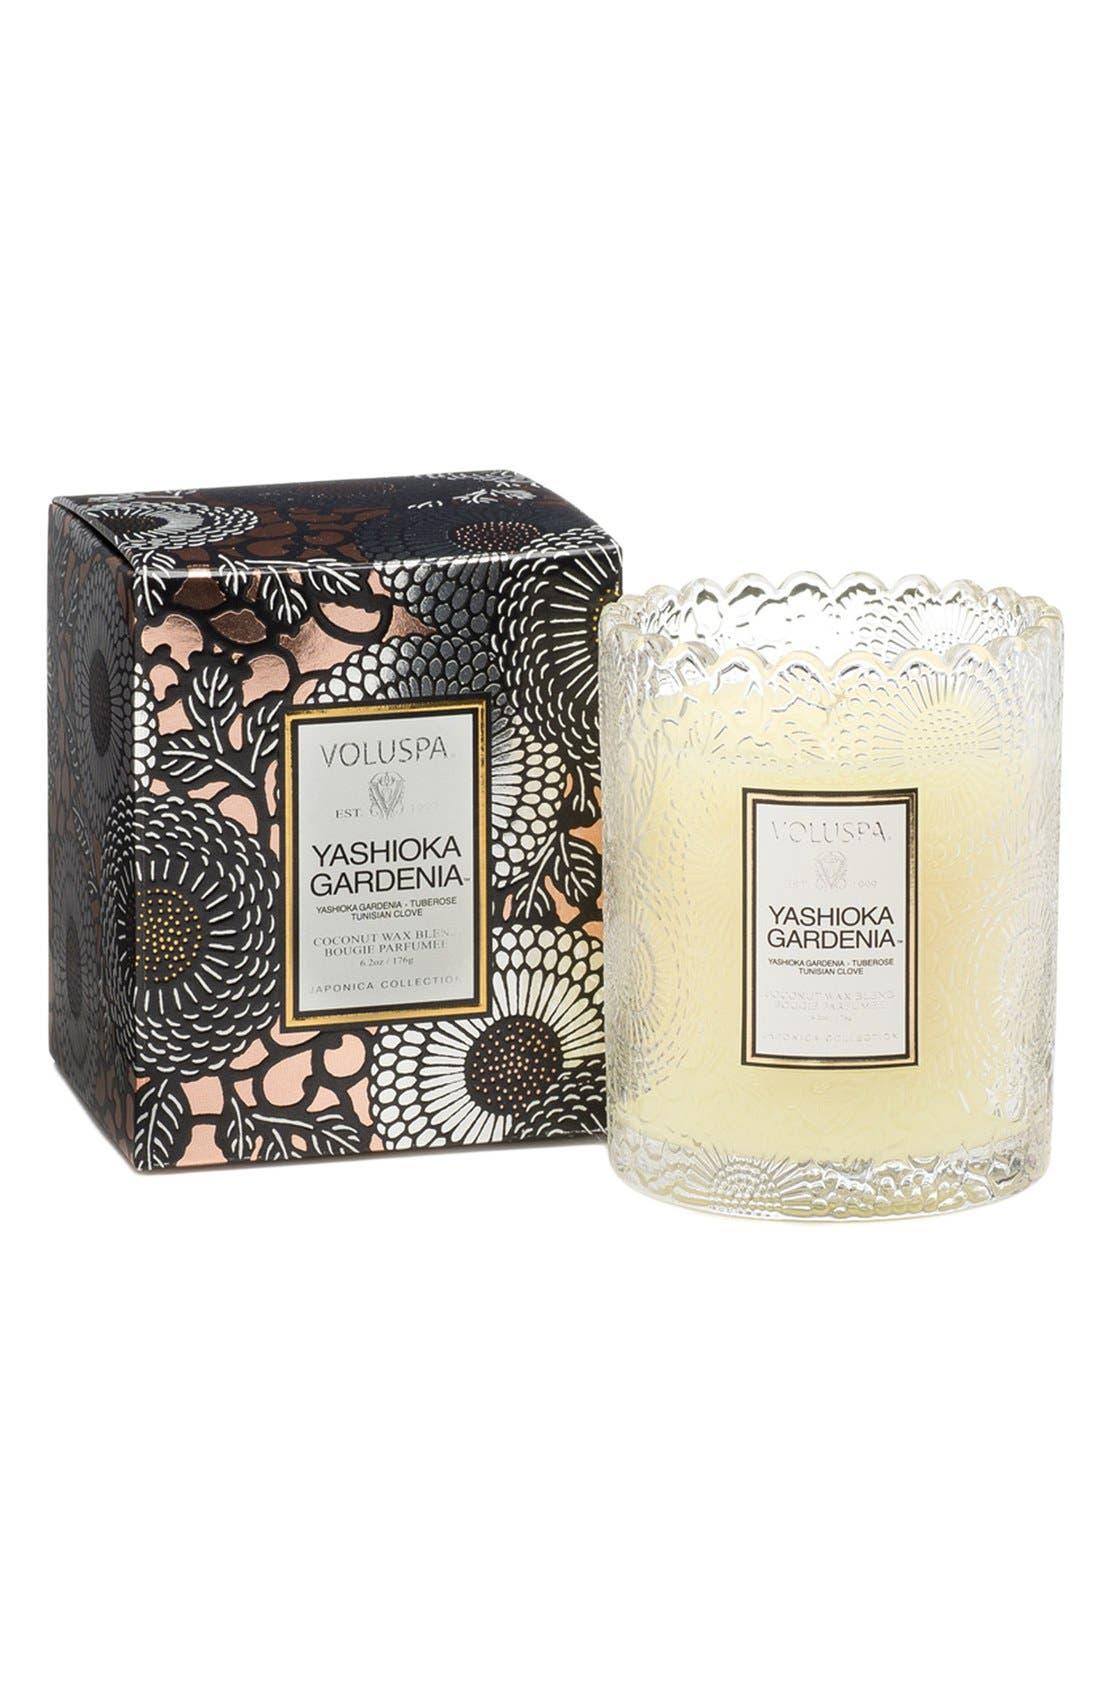 Voluspa 'Japonica - Yashioka Gardenia' Scalloped Edge Glass Candle